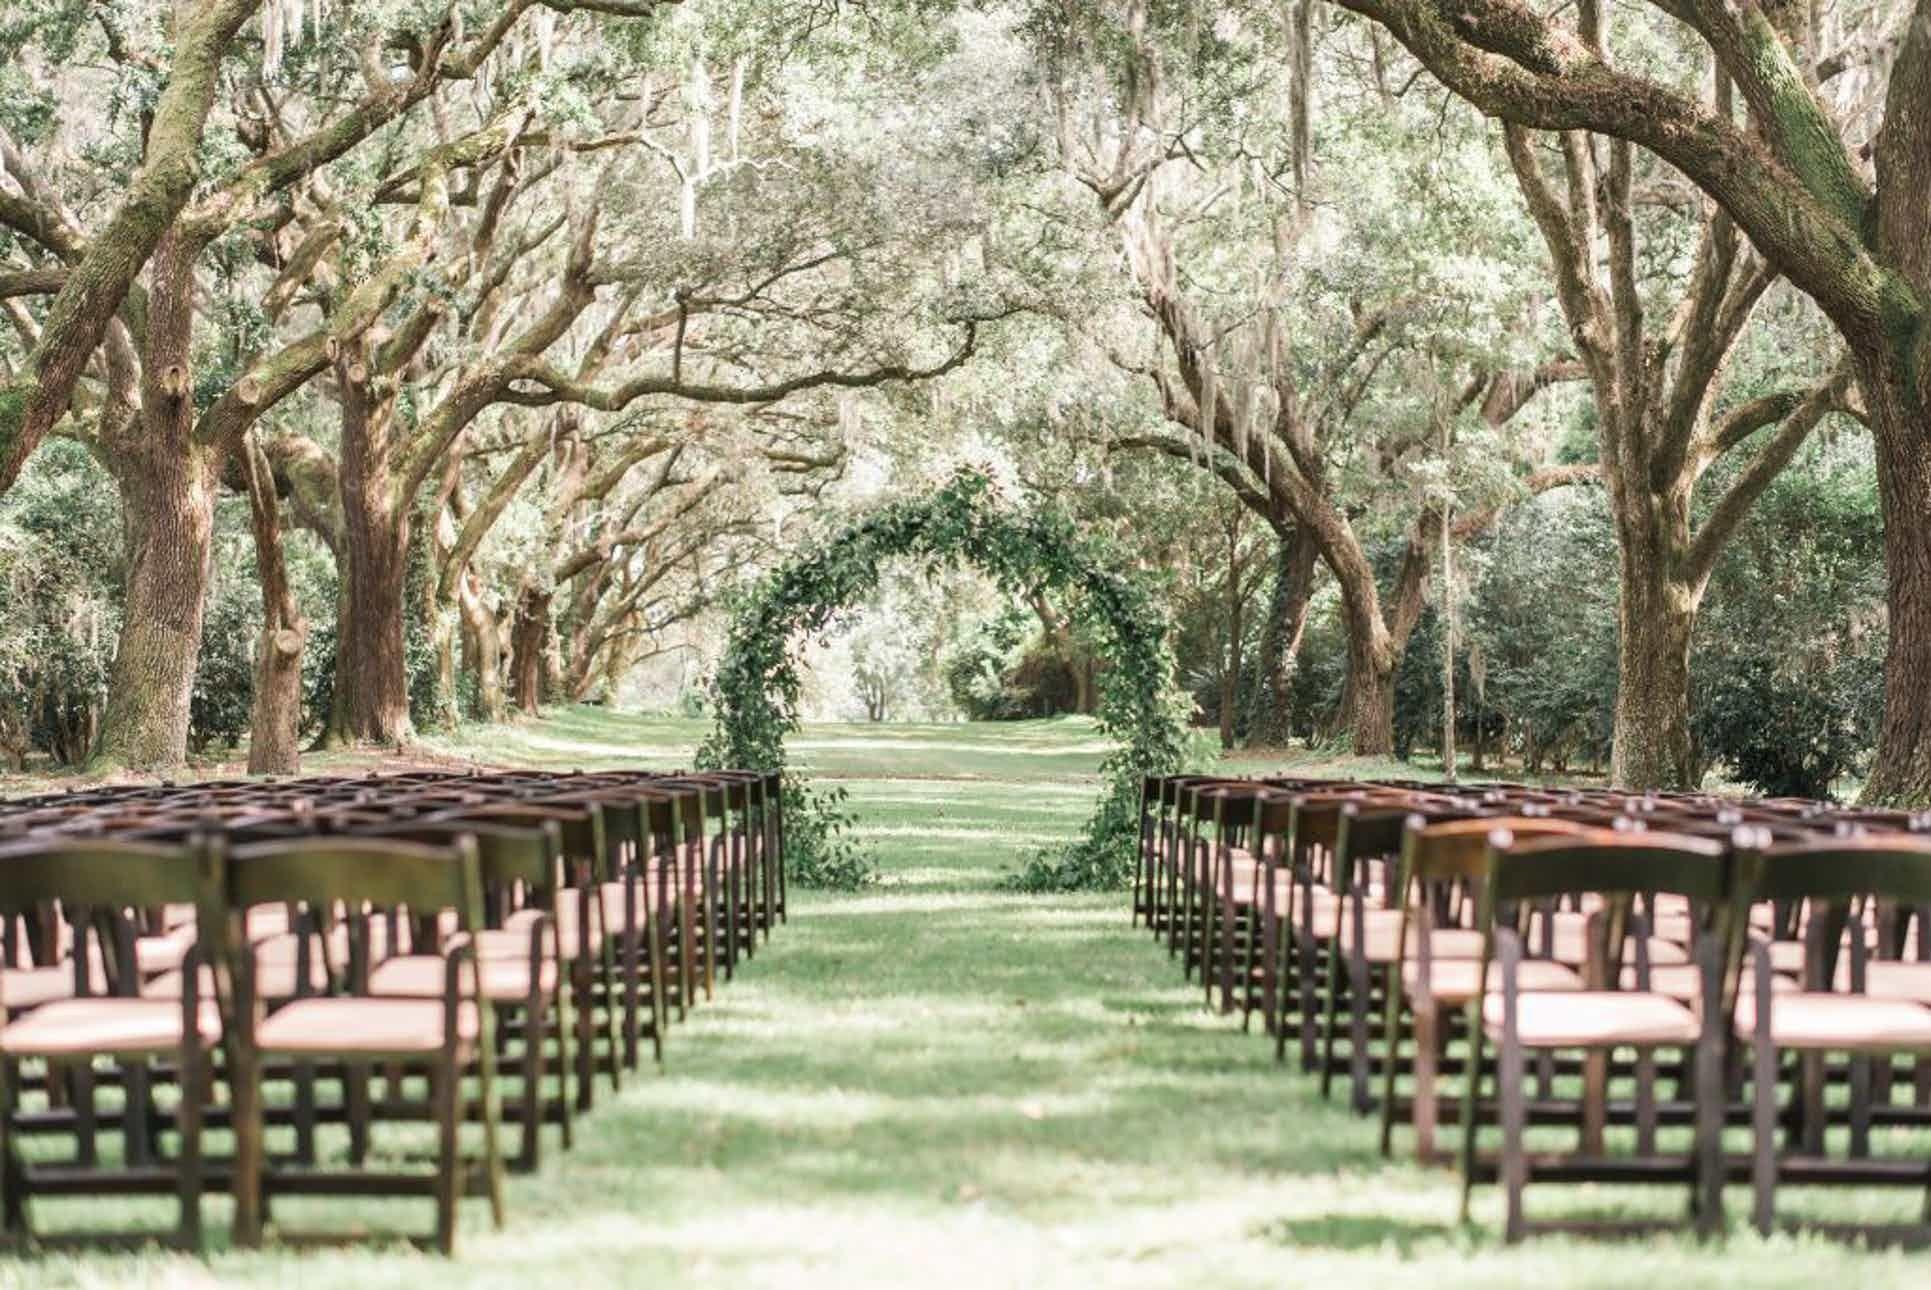 Legare Waring House Charleston Weddings South Carolina Wedding Venues 29407 Wedding Venues South Carolina Outdoor Wedding Venues South Carolina Wedding